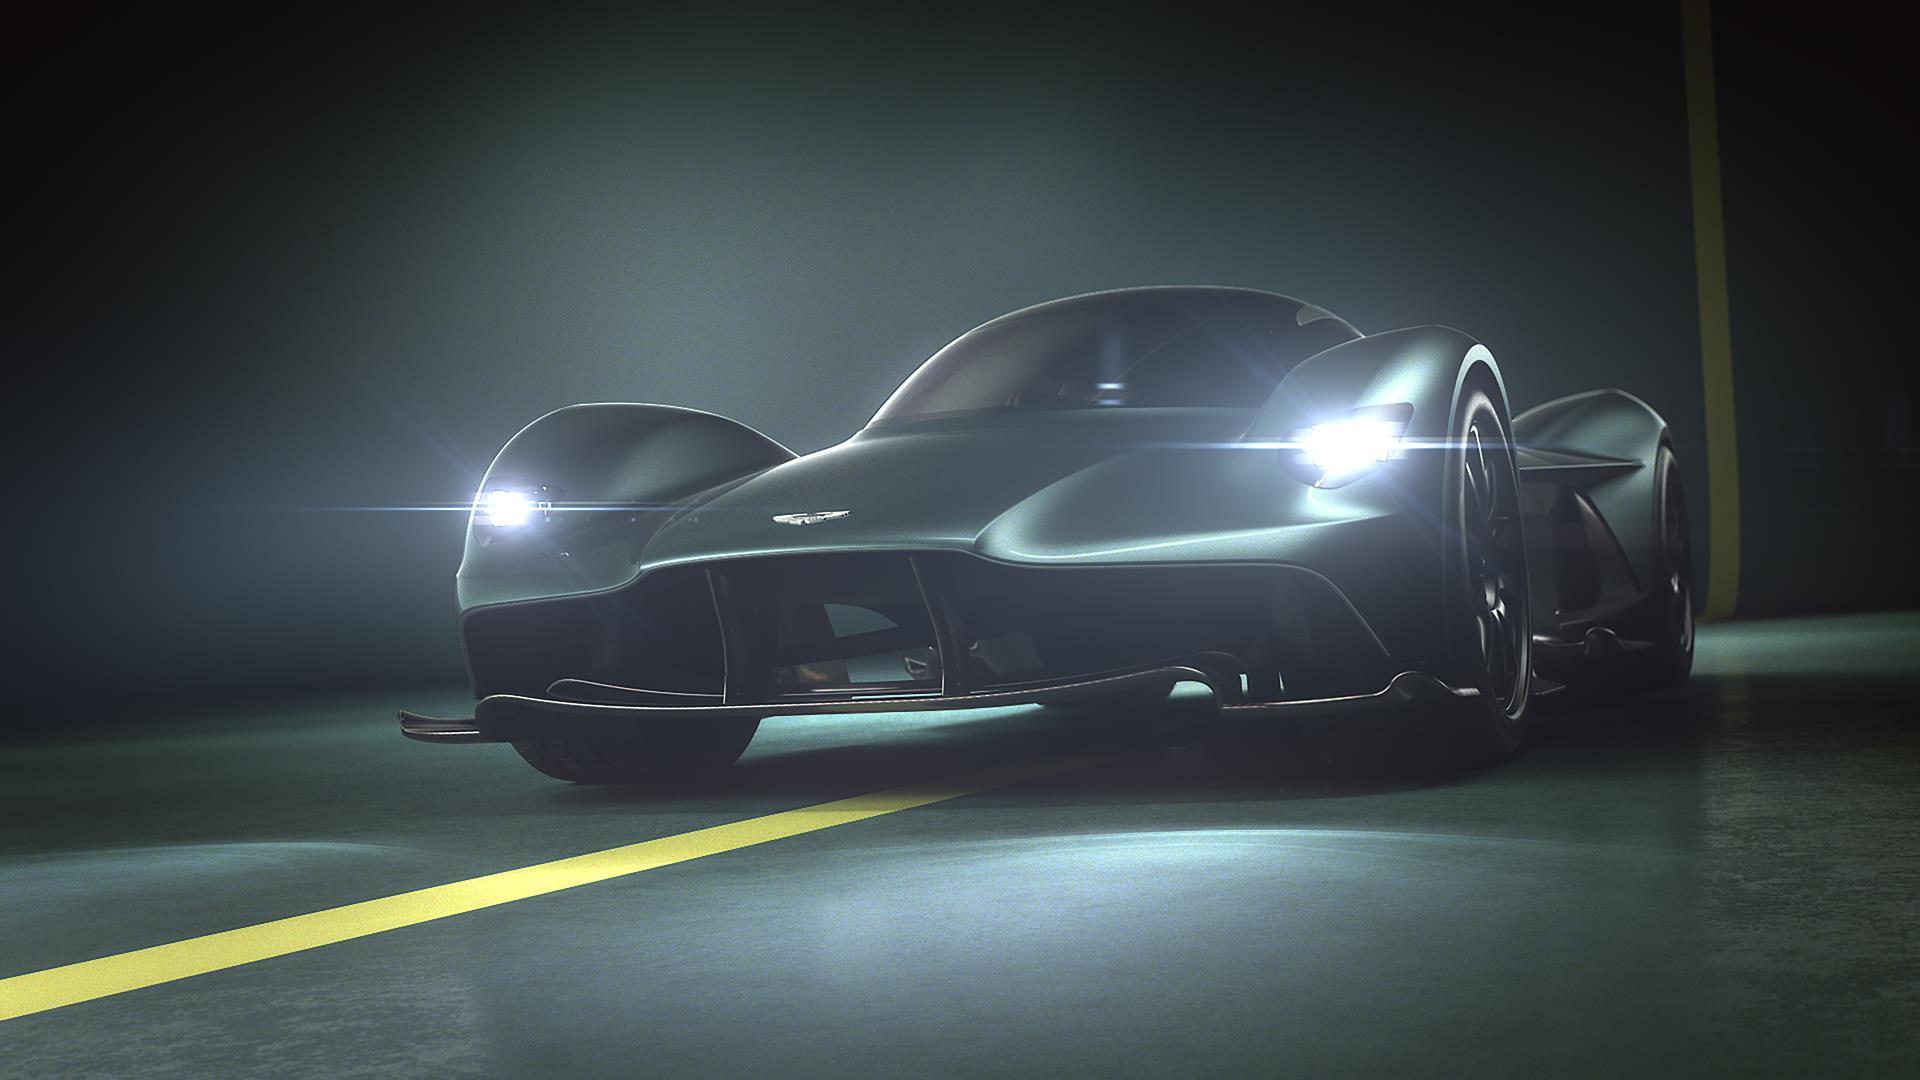 2017 Aston Martin Valkyrie News and Information